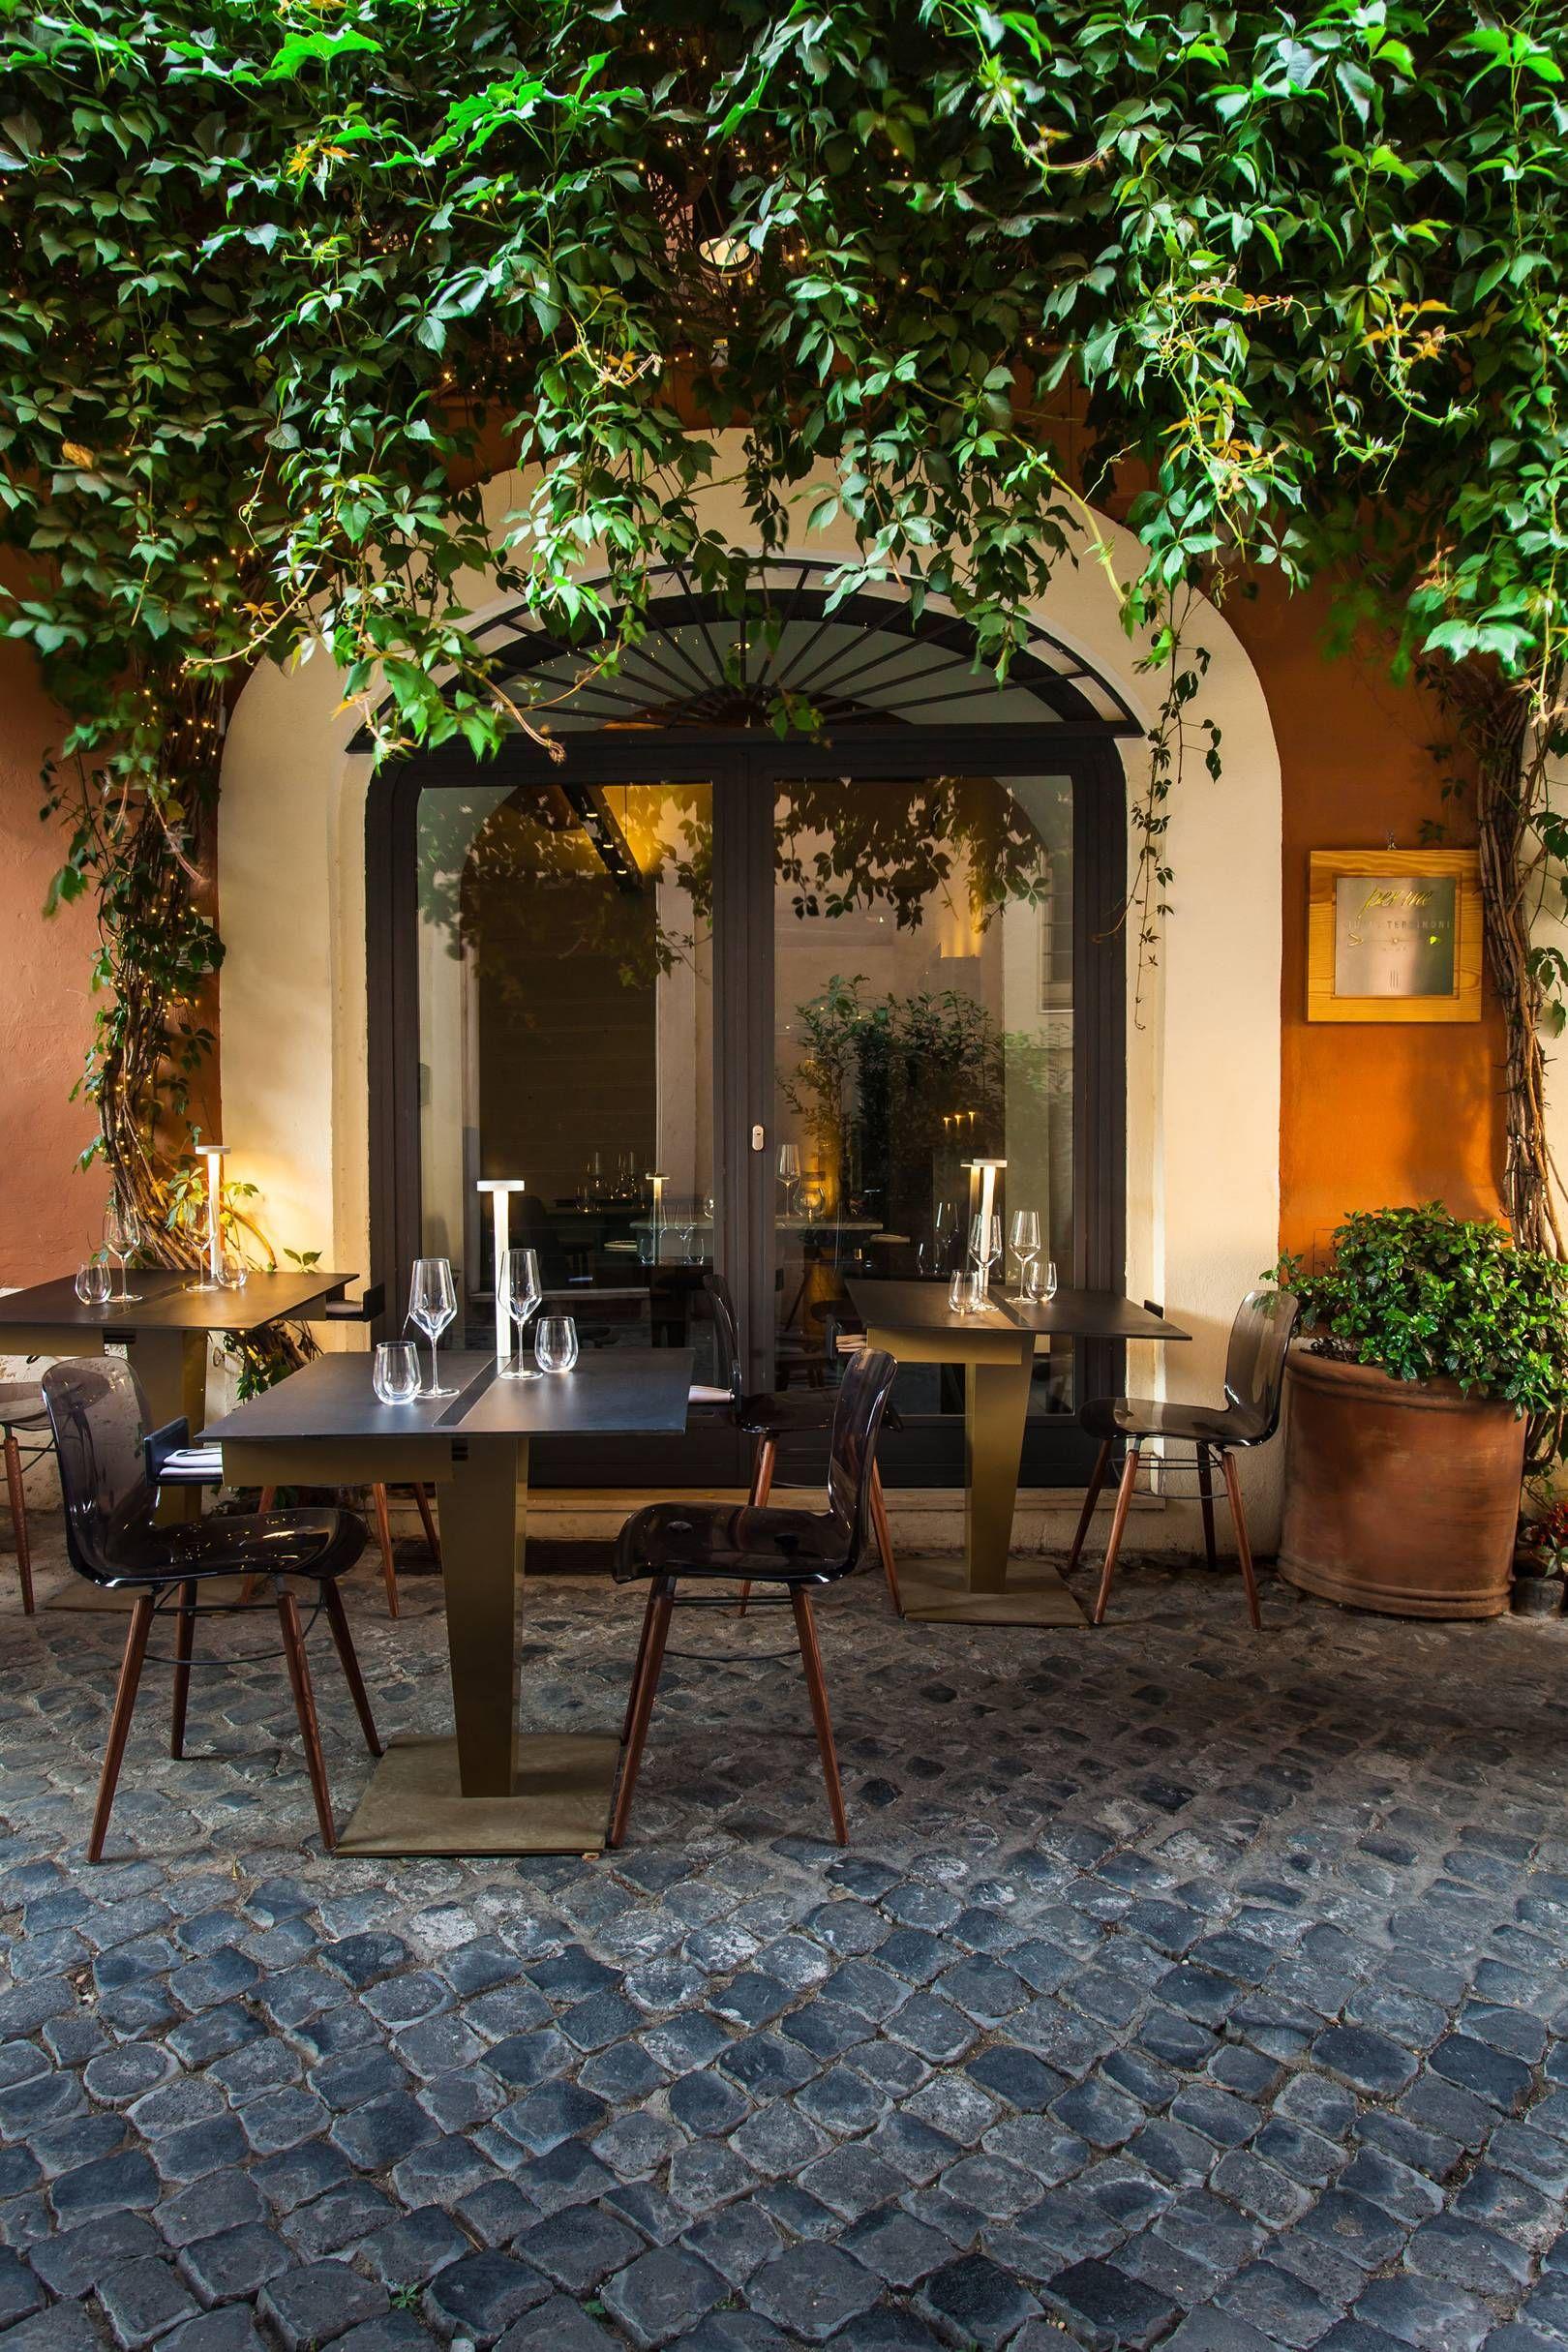 The 10 best restaurants in Rome Best restaurants in rome